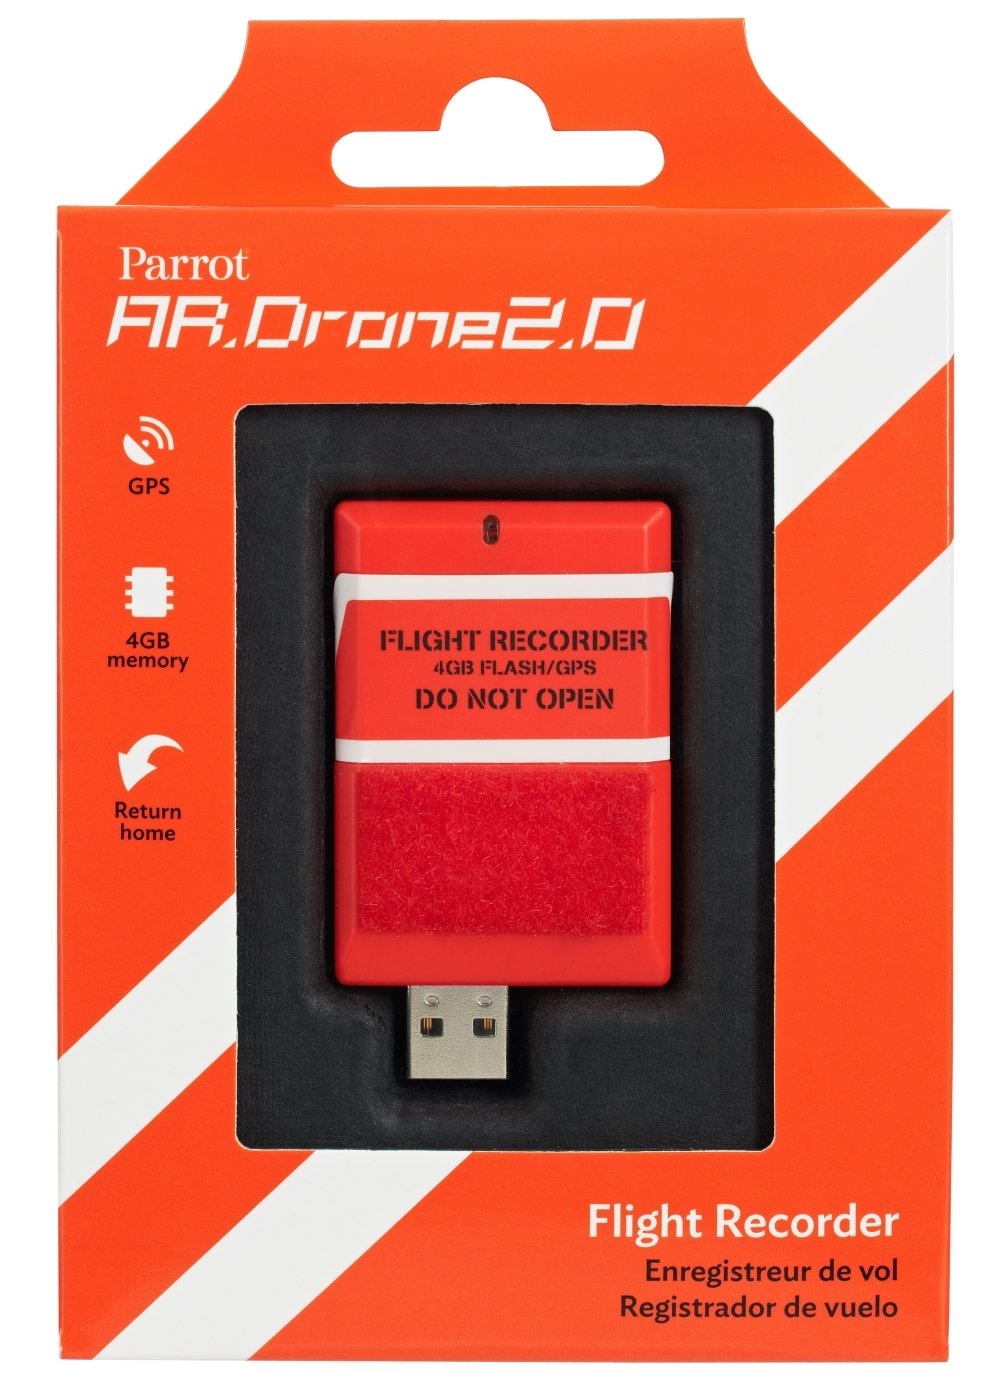 Parrot AR.DRONE 2.0 Flight Recorder: GPS, 4GB, return to take-off...